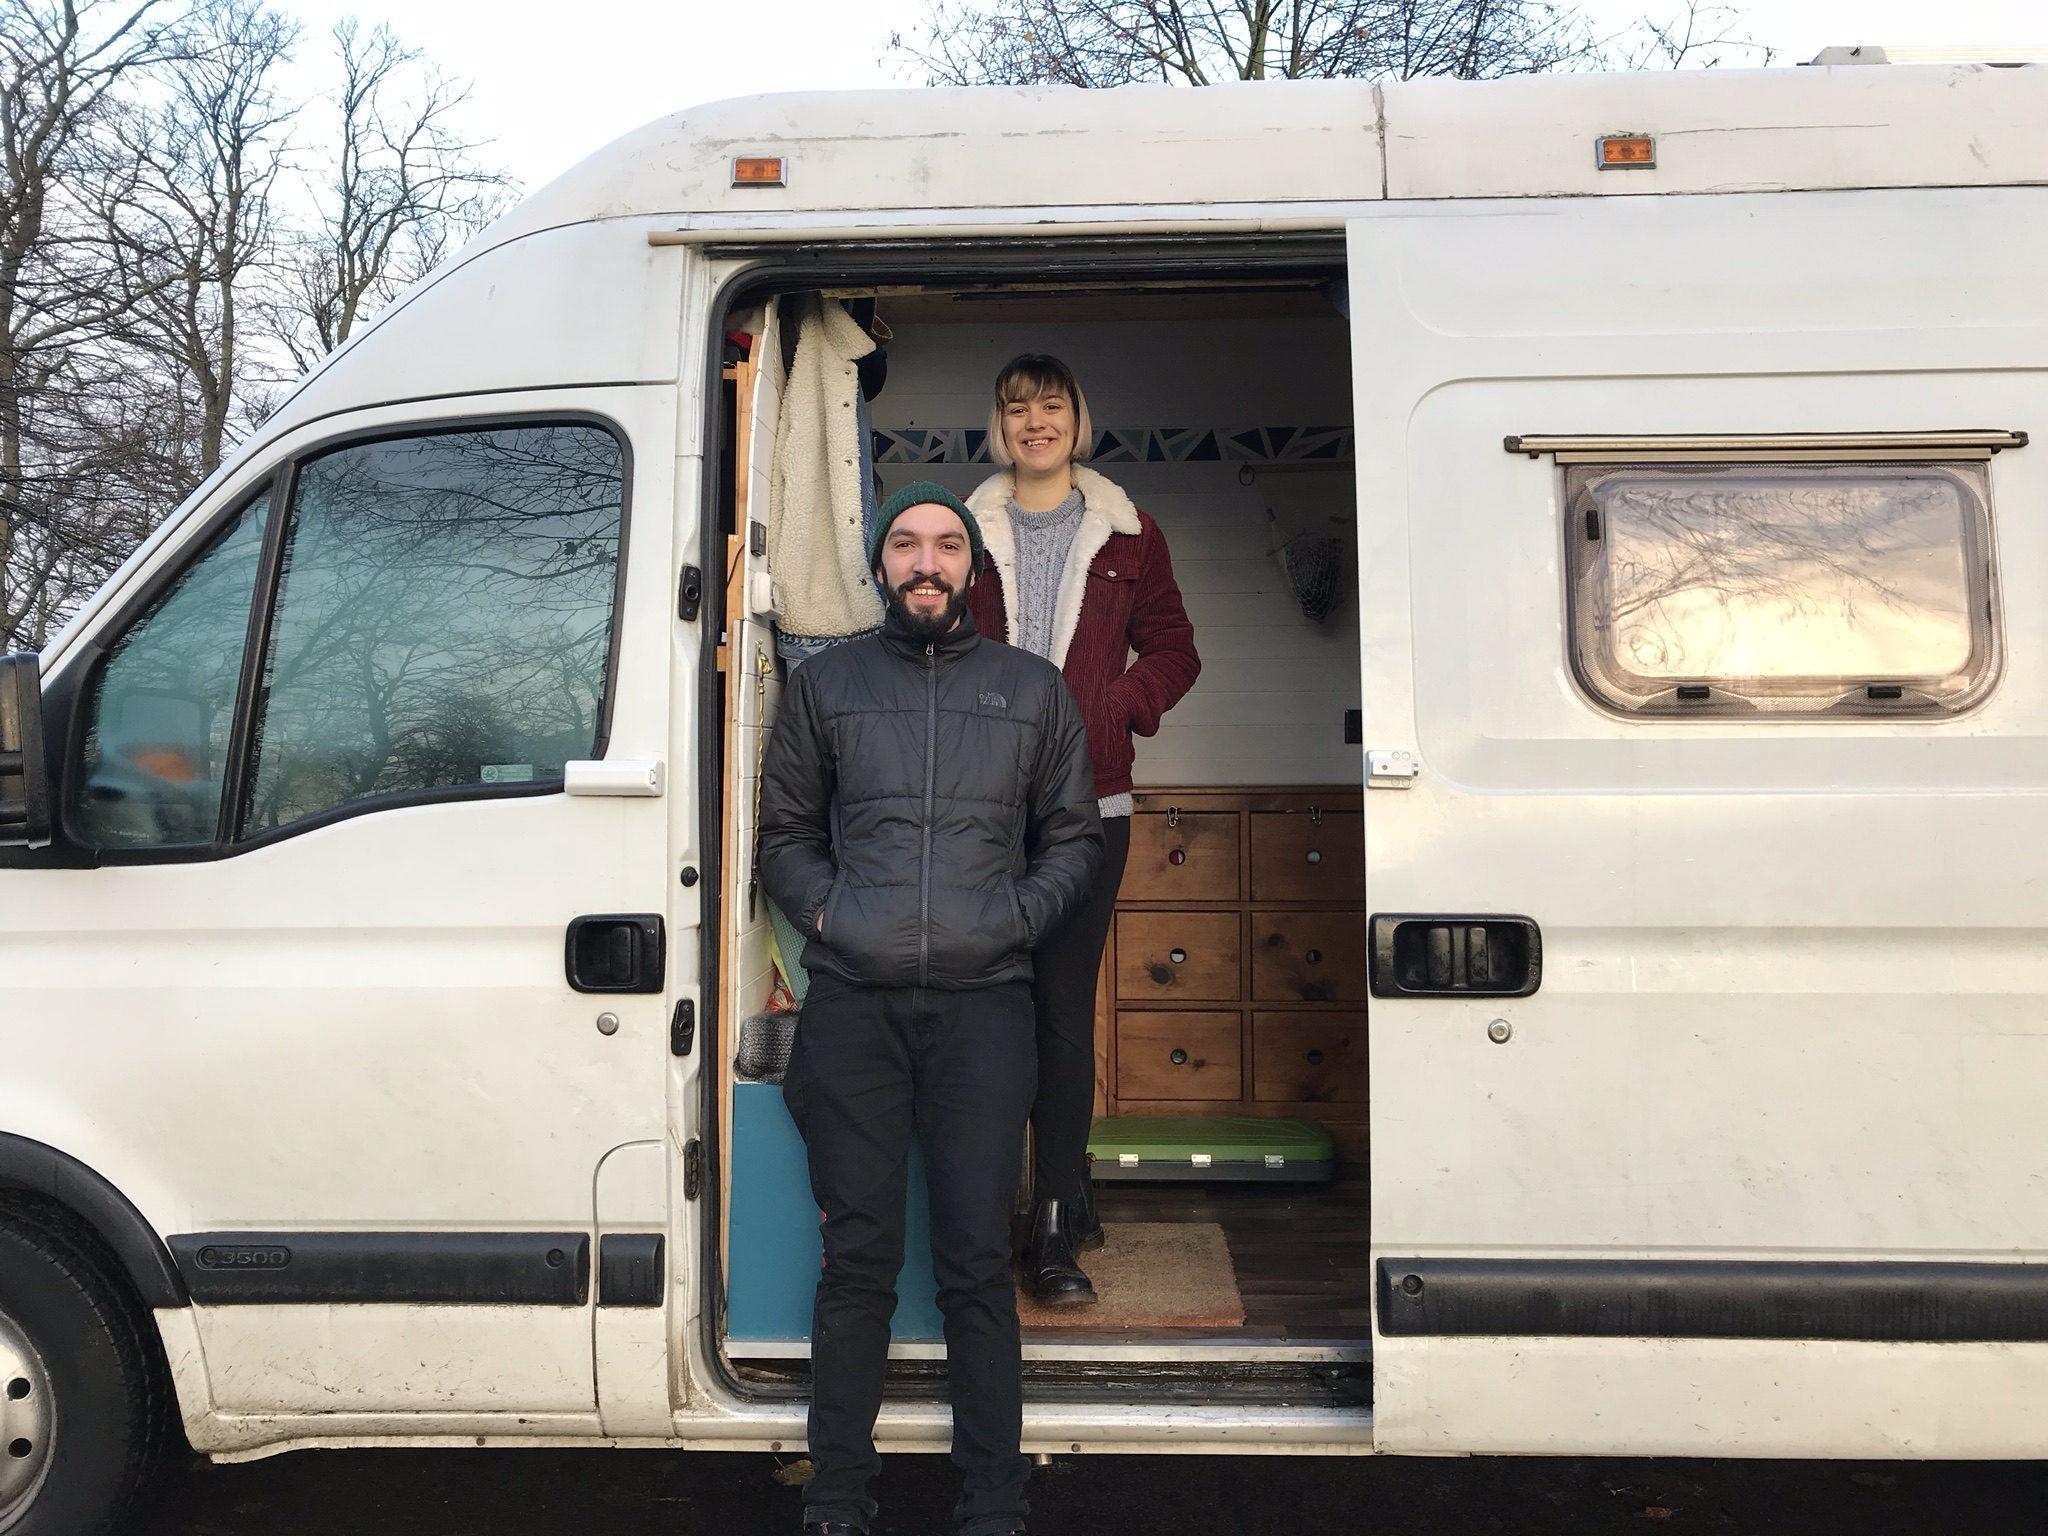 Travelling in a van - faith